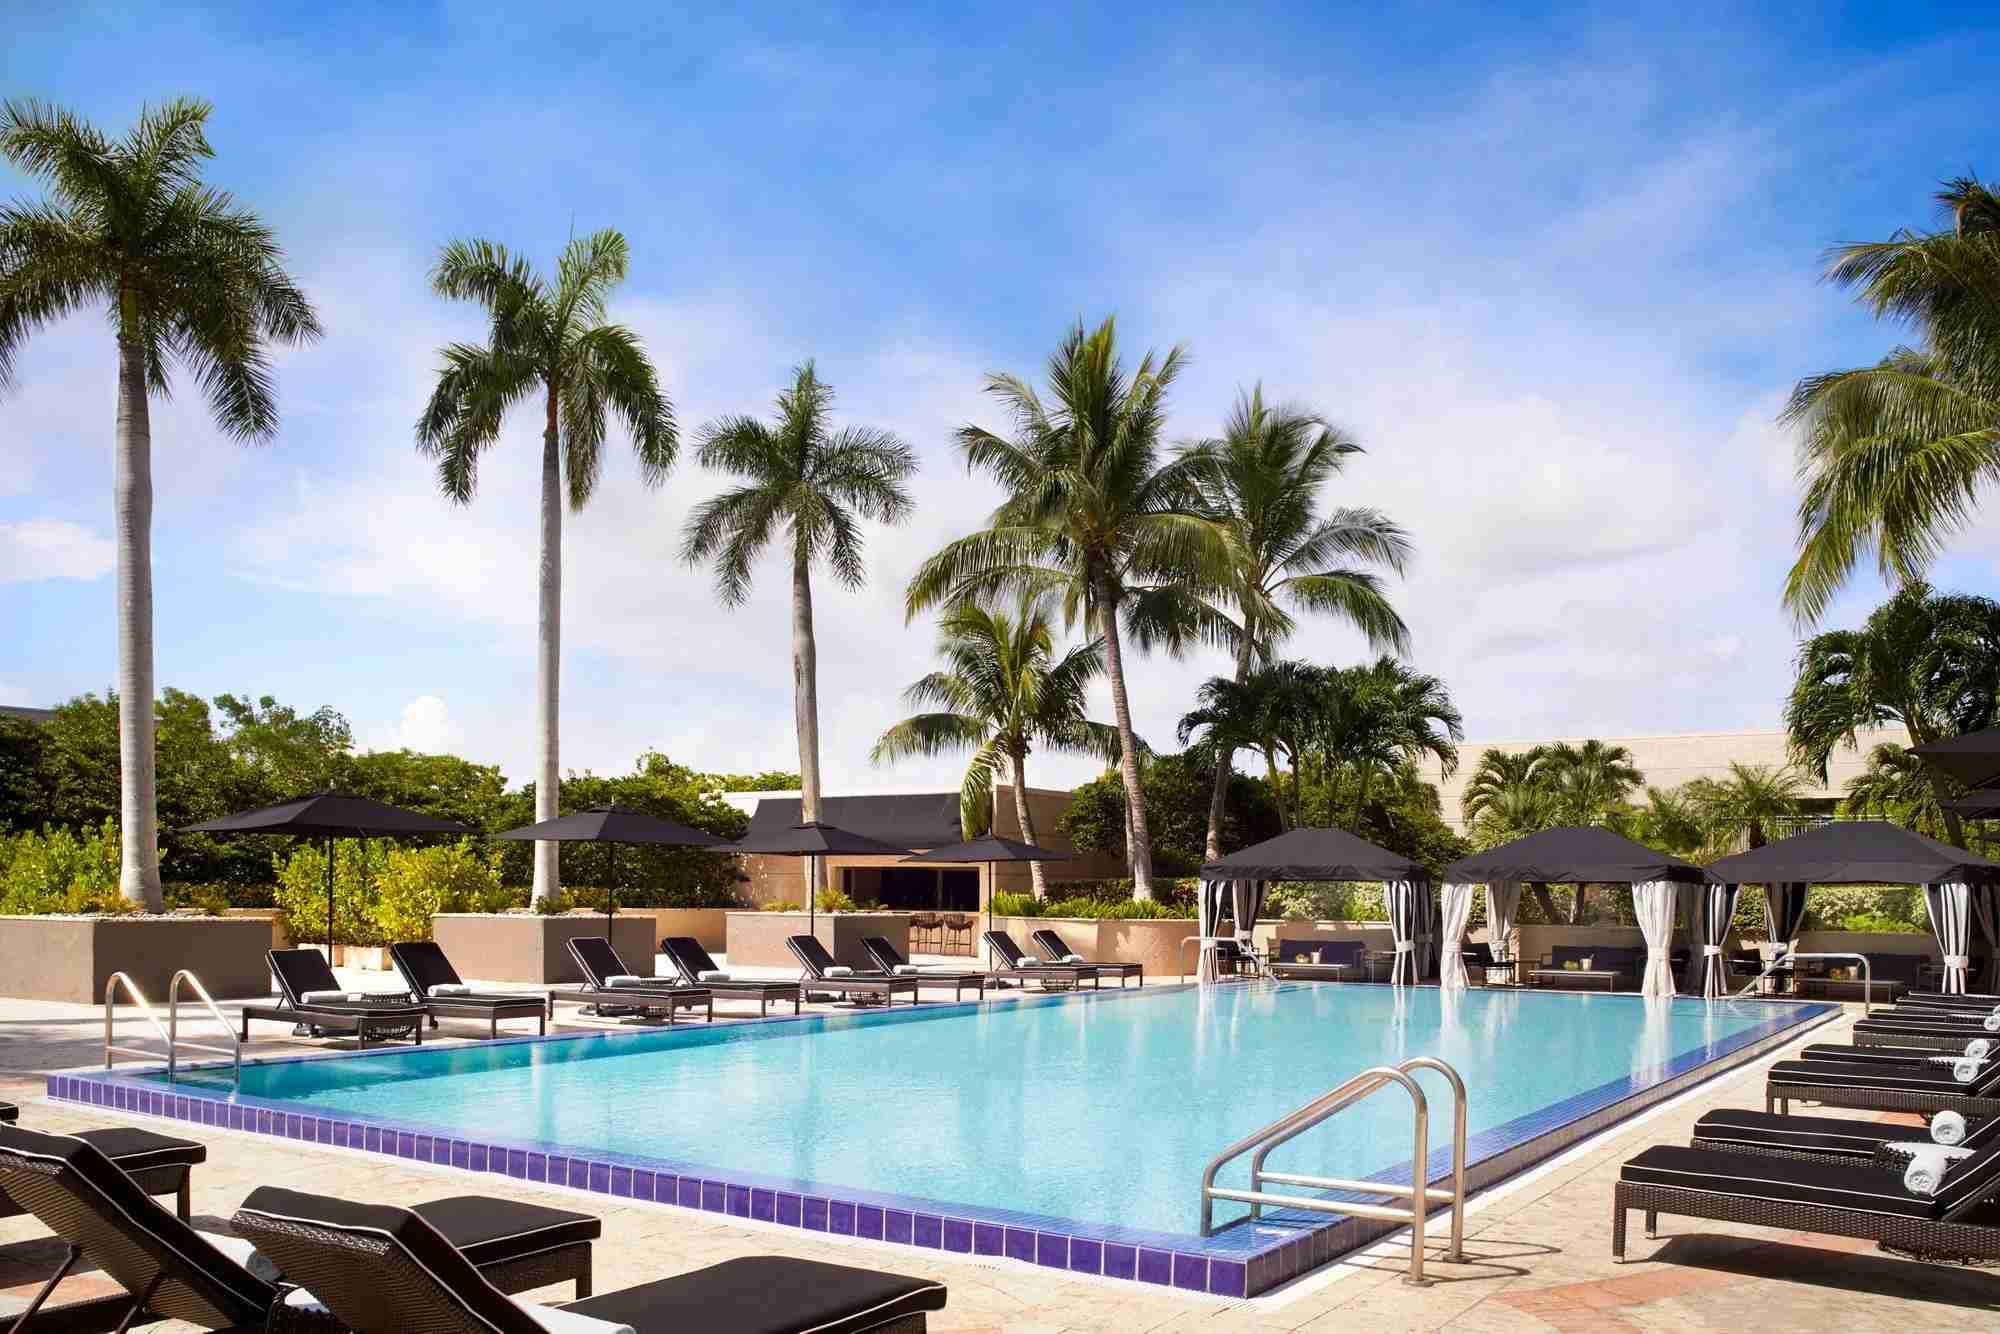 Ritz Carlton Coconut Grove. Photo courtesy of the hotel